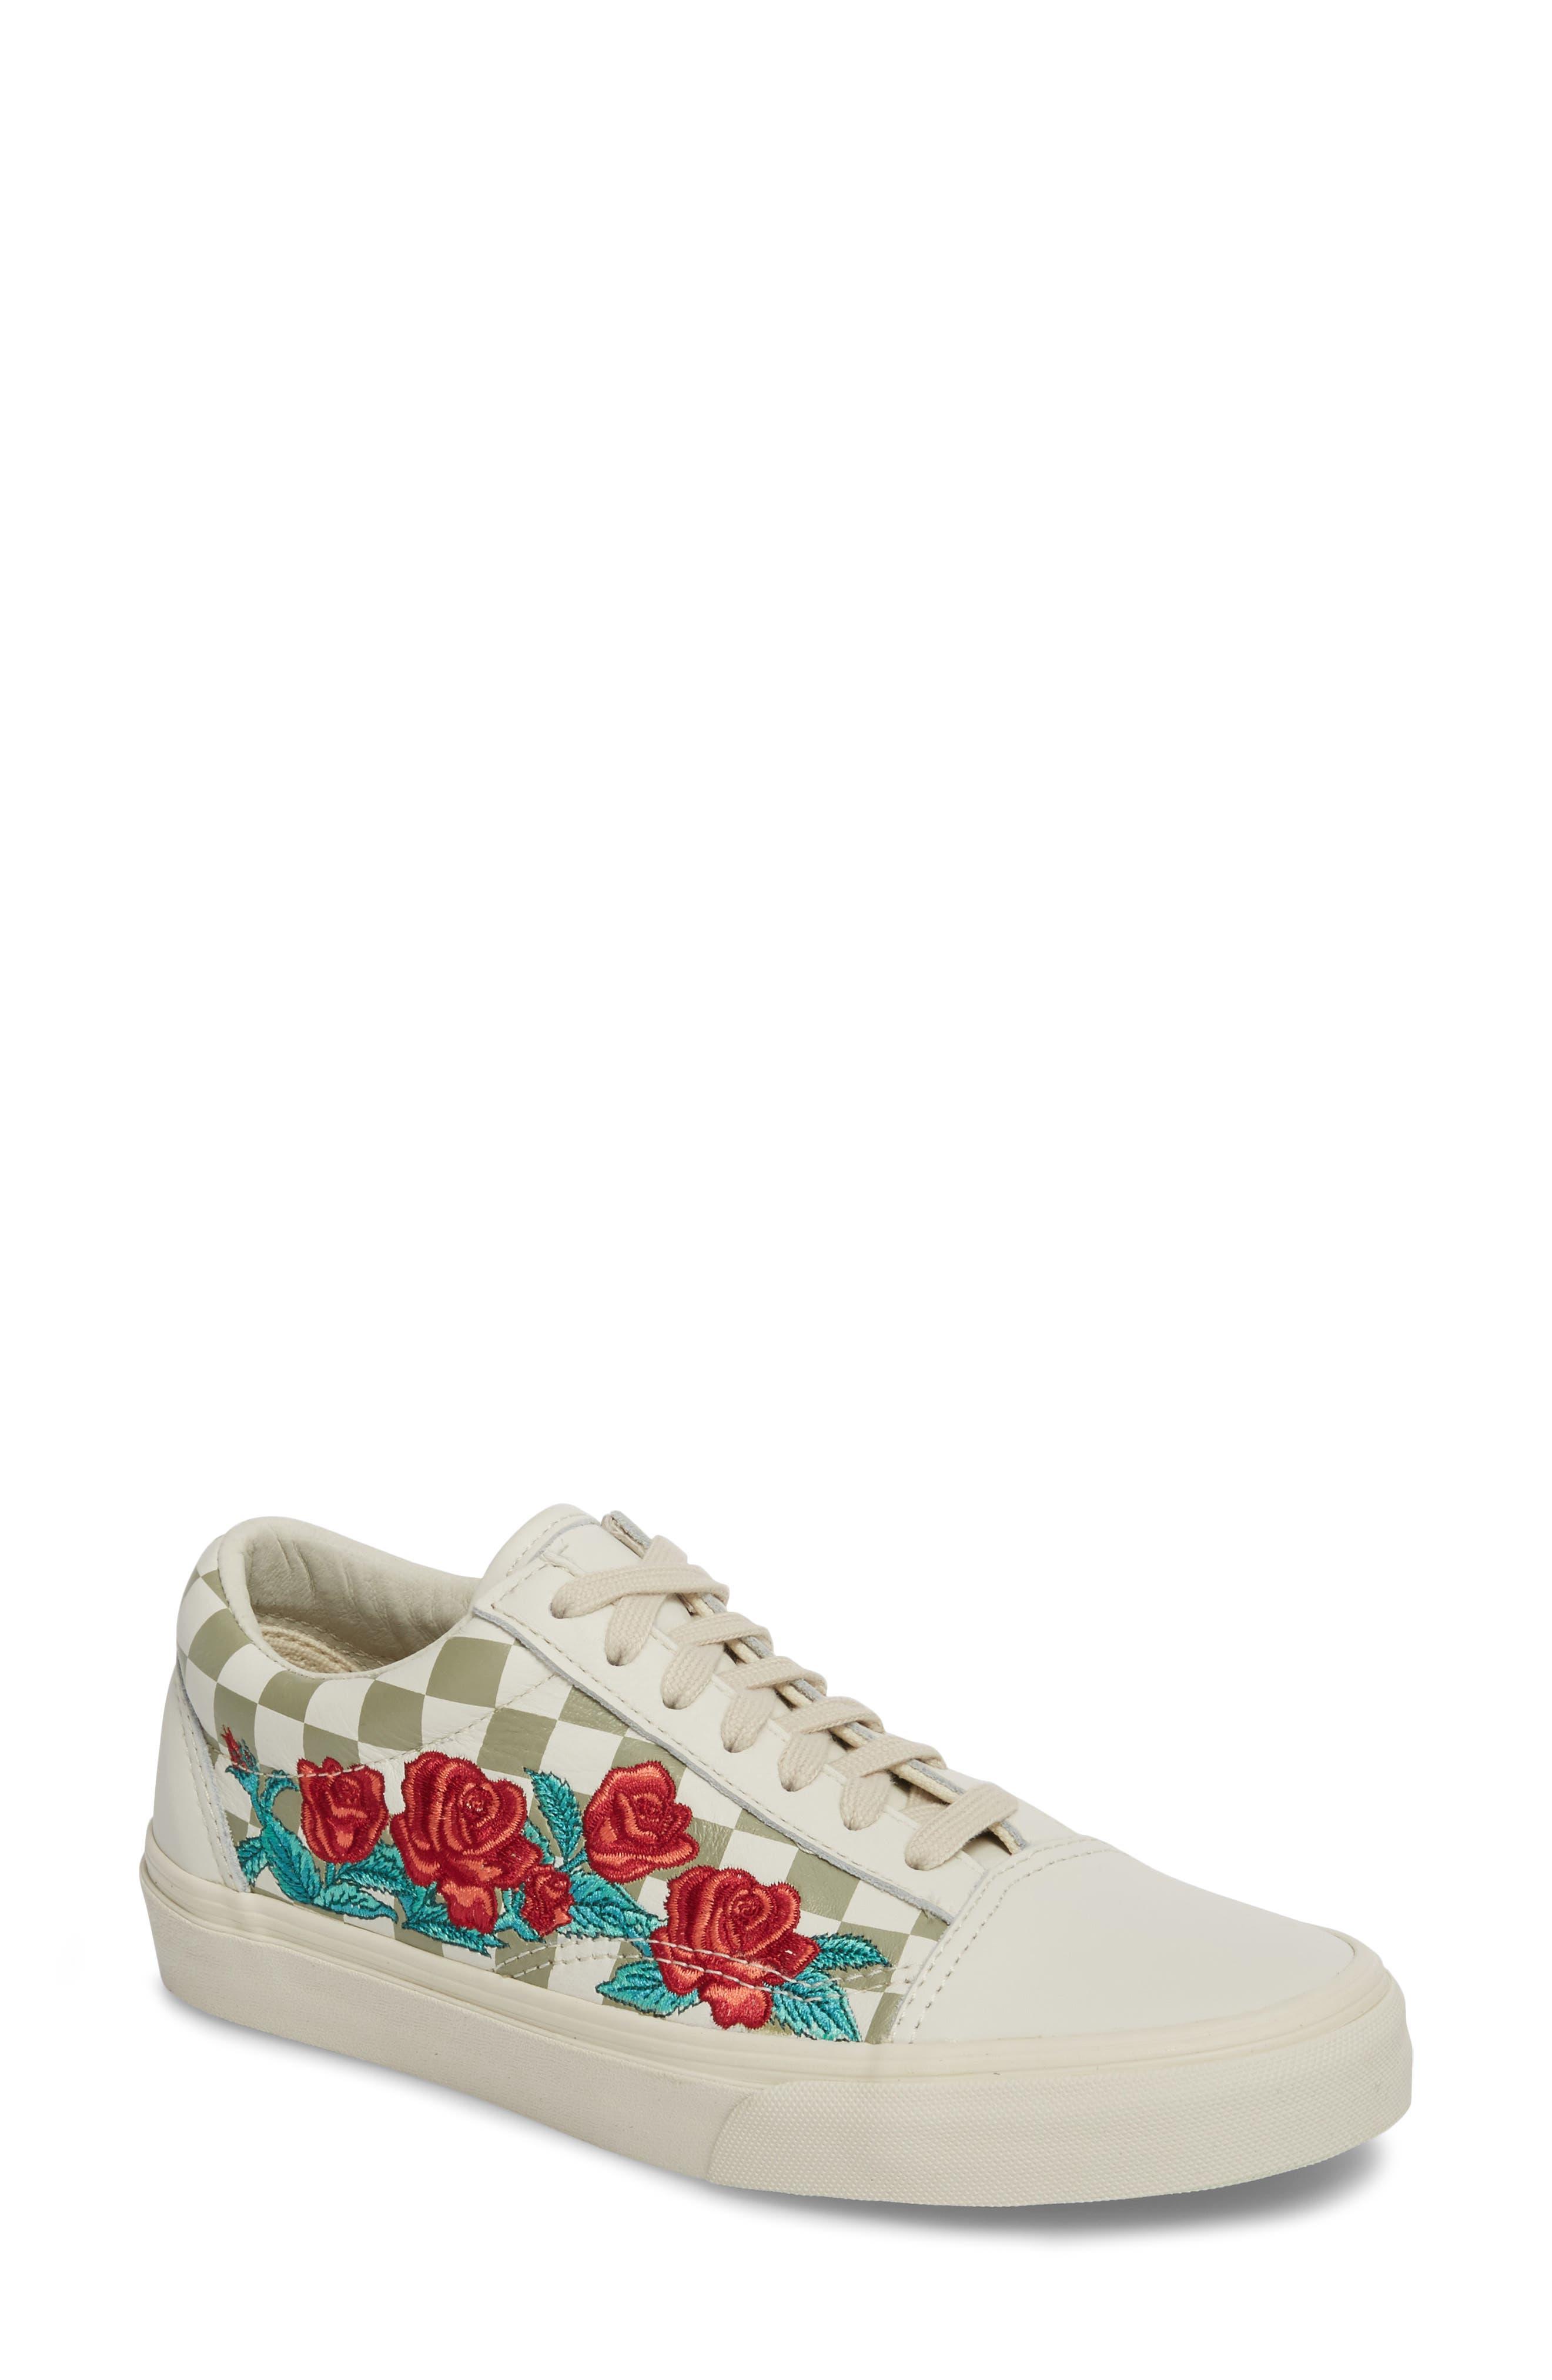 Vans Old Skool 36 DX Sneaker (Women)